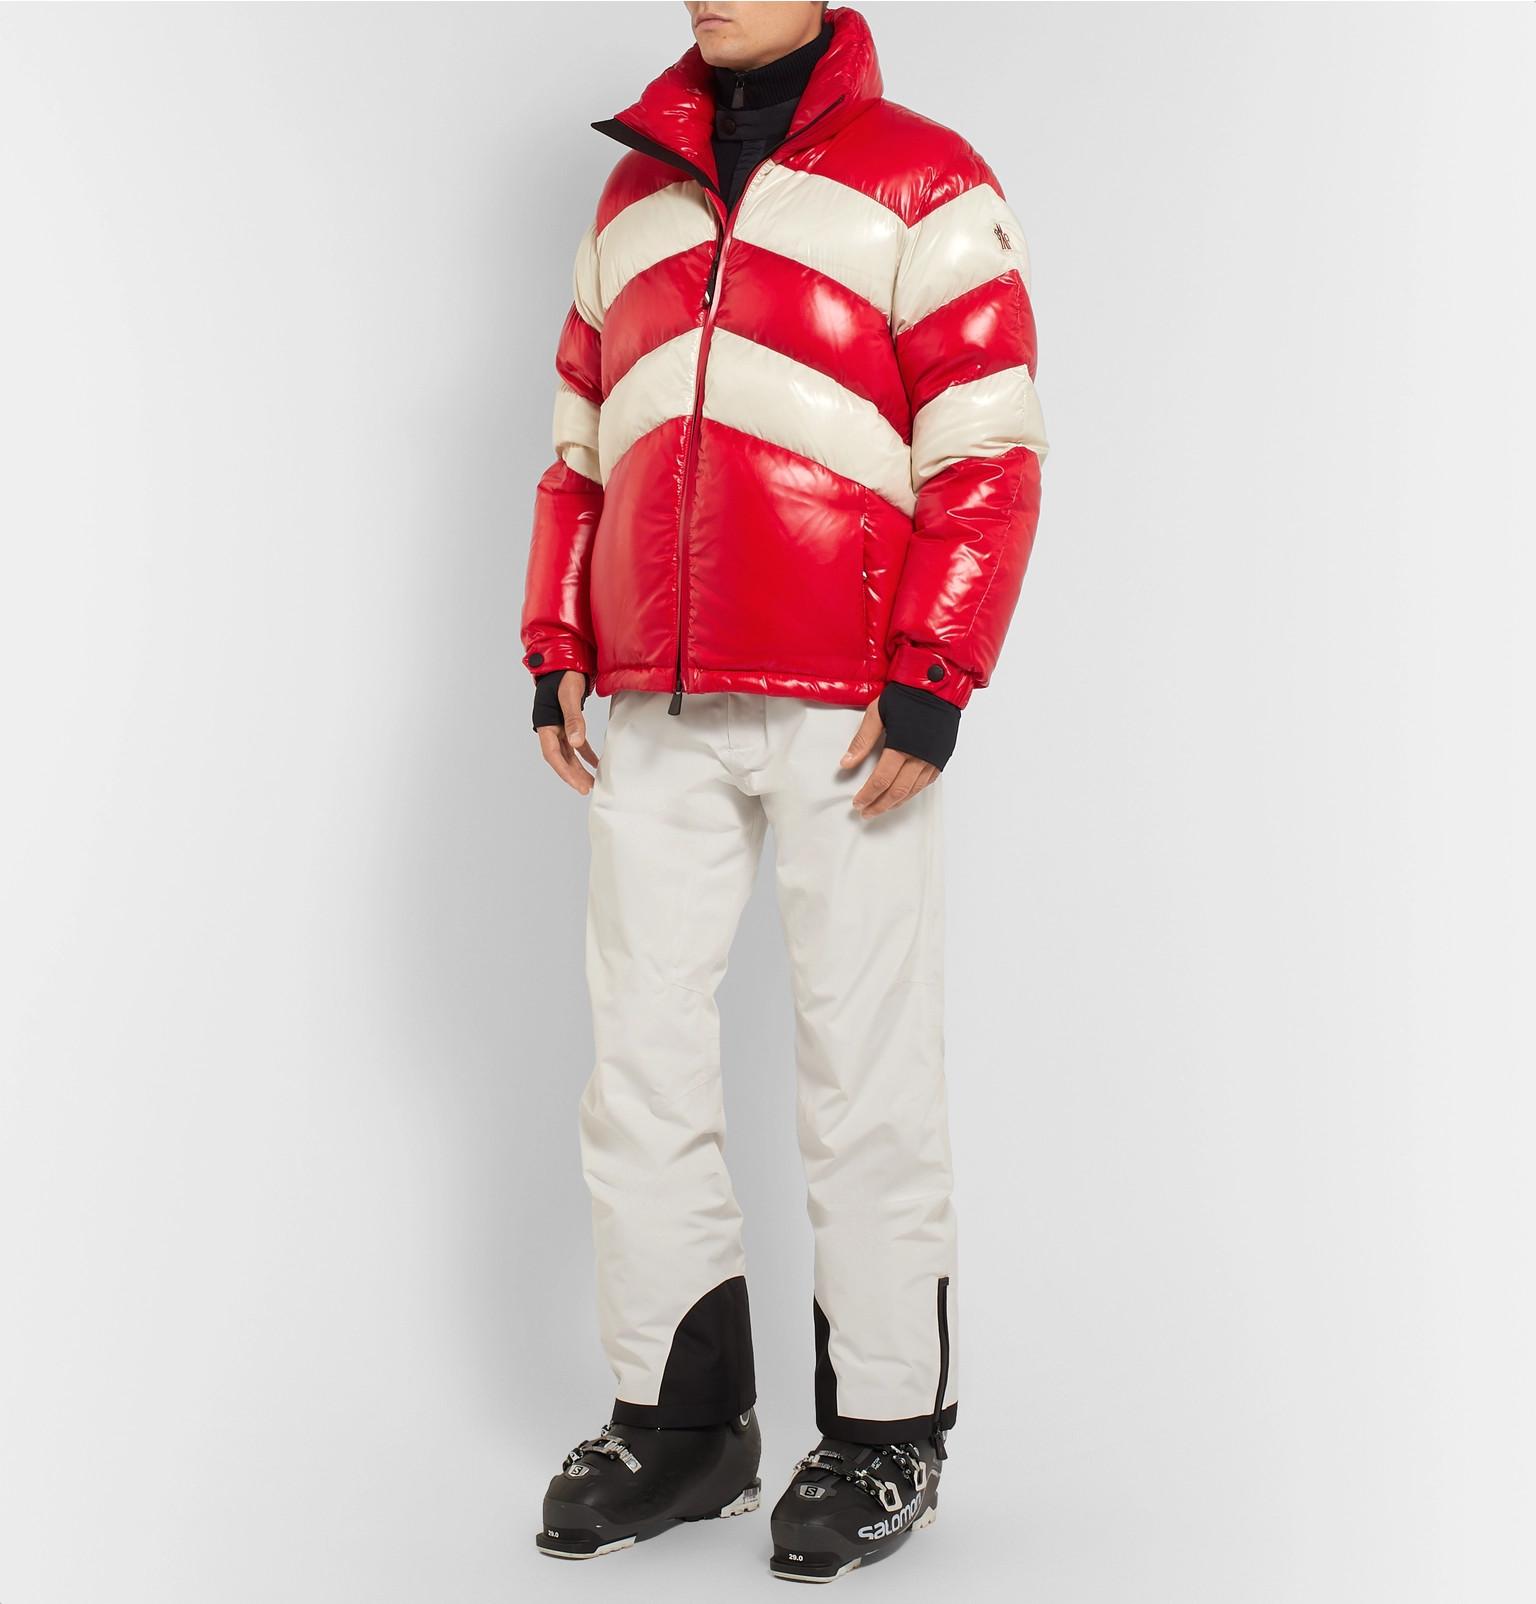 e162e3f1d972 Moncler Grenoble - Golzern Colour-Block Quilted Down Ski Jacket